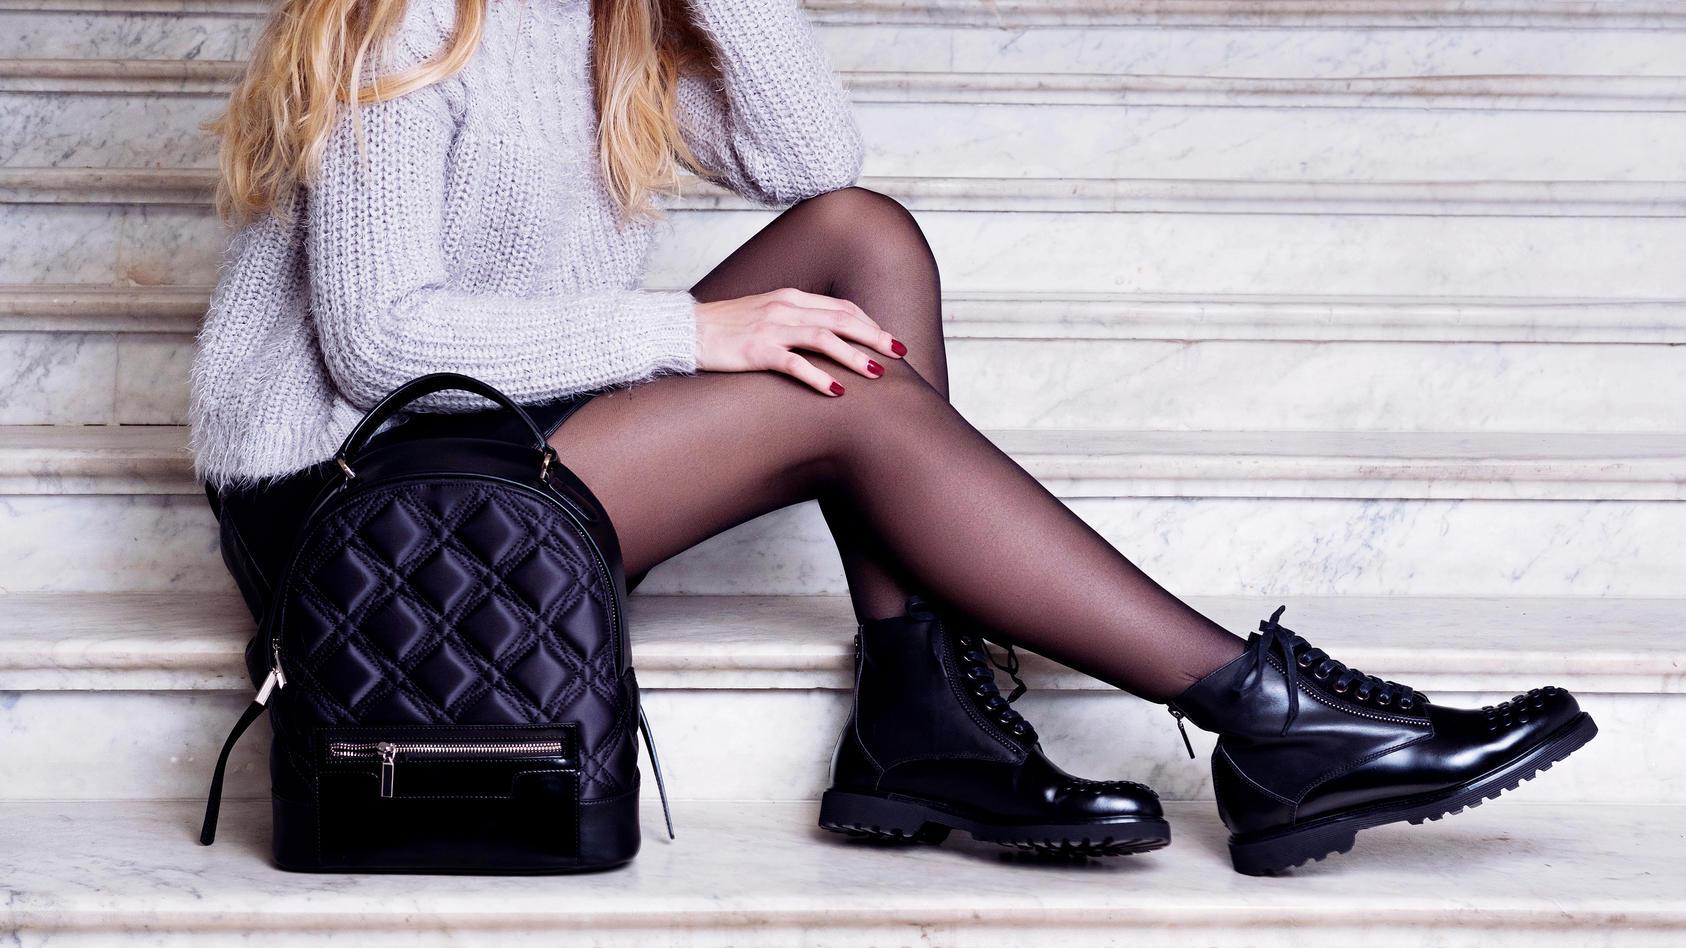 Outfit-Ideen: Diese 3 Kombinationen retten den Alltag.